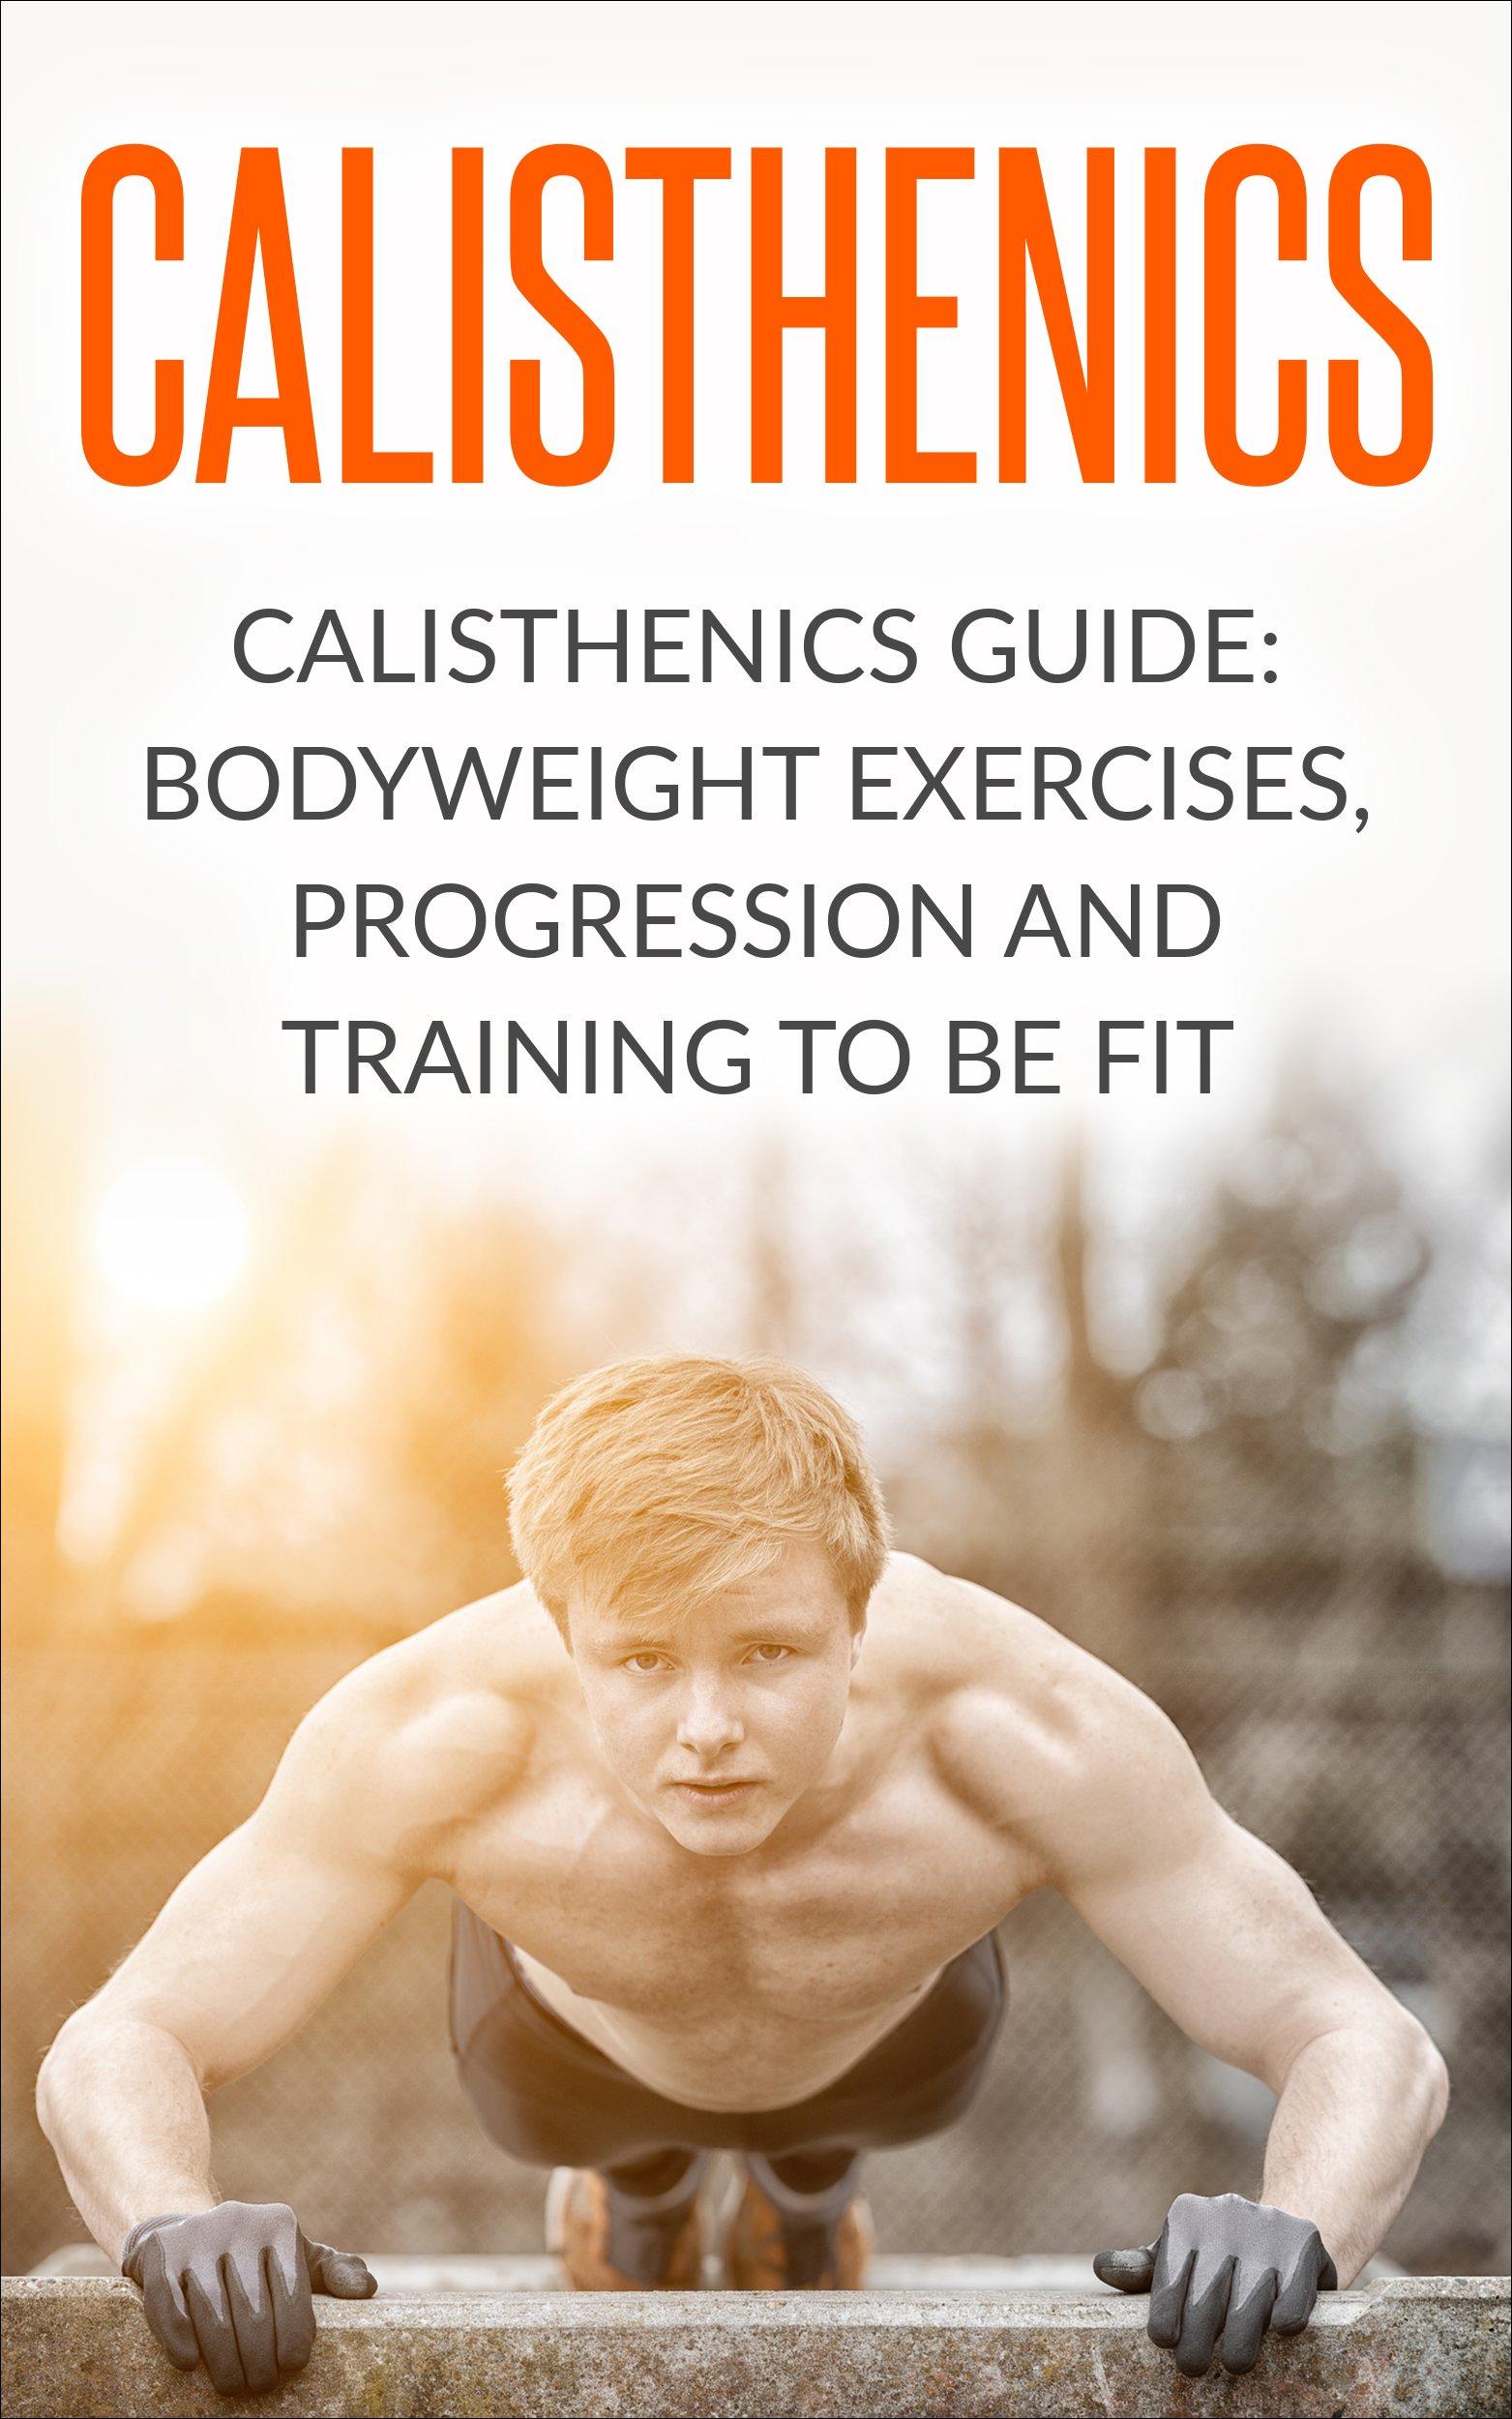 Calisthenics  Calisthenics Guide  BodyWeight Exercises Workout Progression And Training To Be Fit  Calisthenics Calisthenics Bodyweight Workout Calisthenics ... Exercises Book 1   English Edition